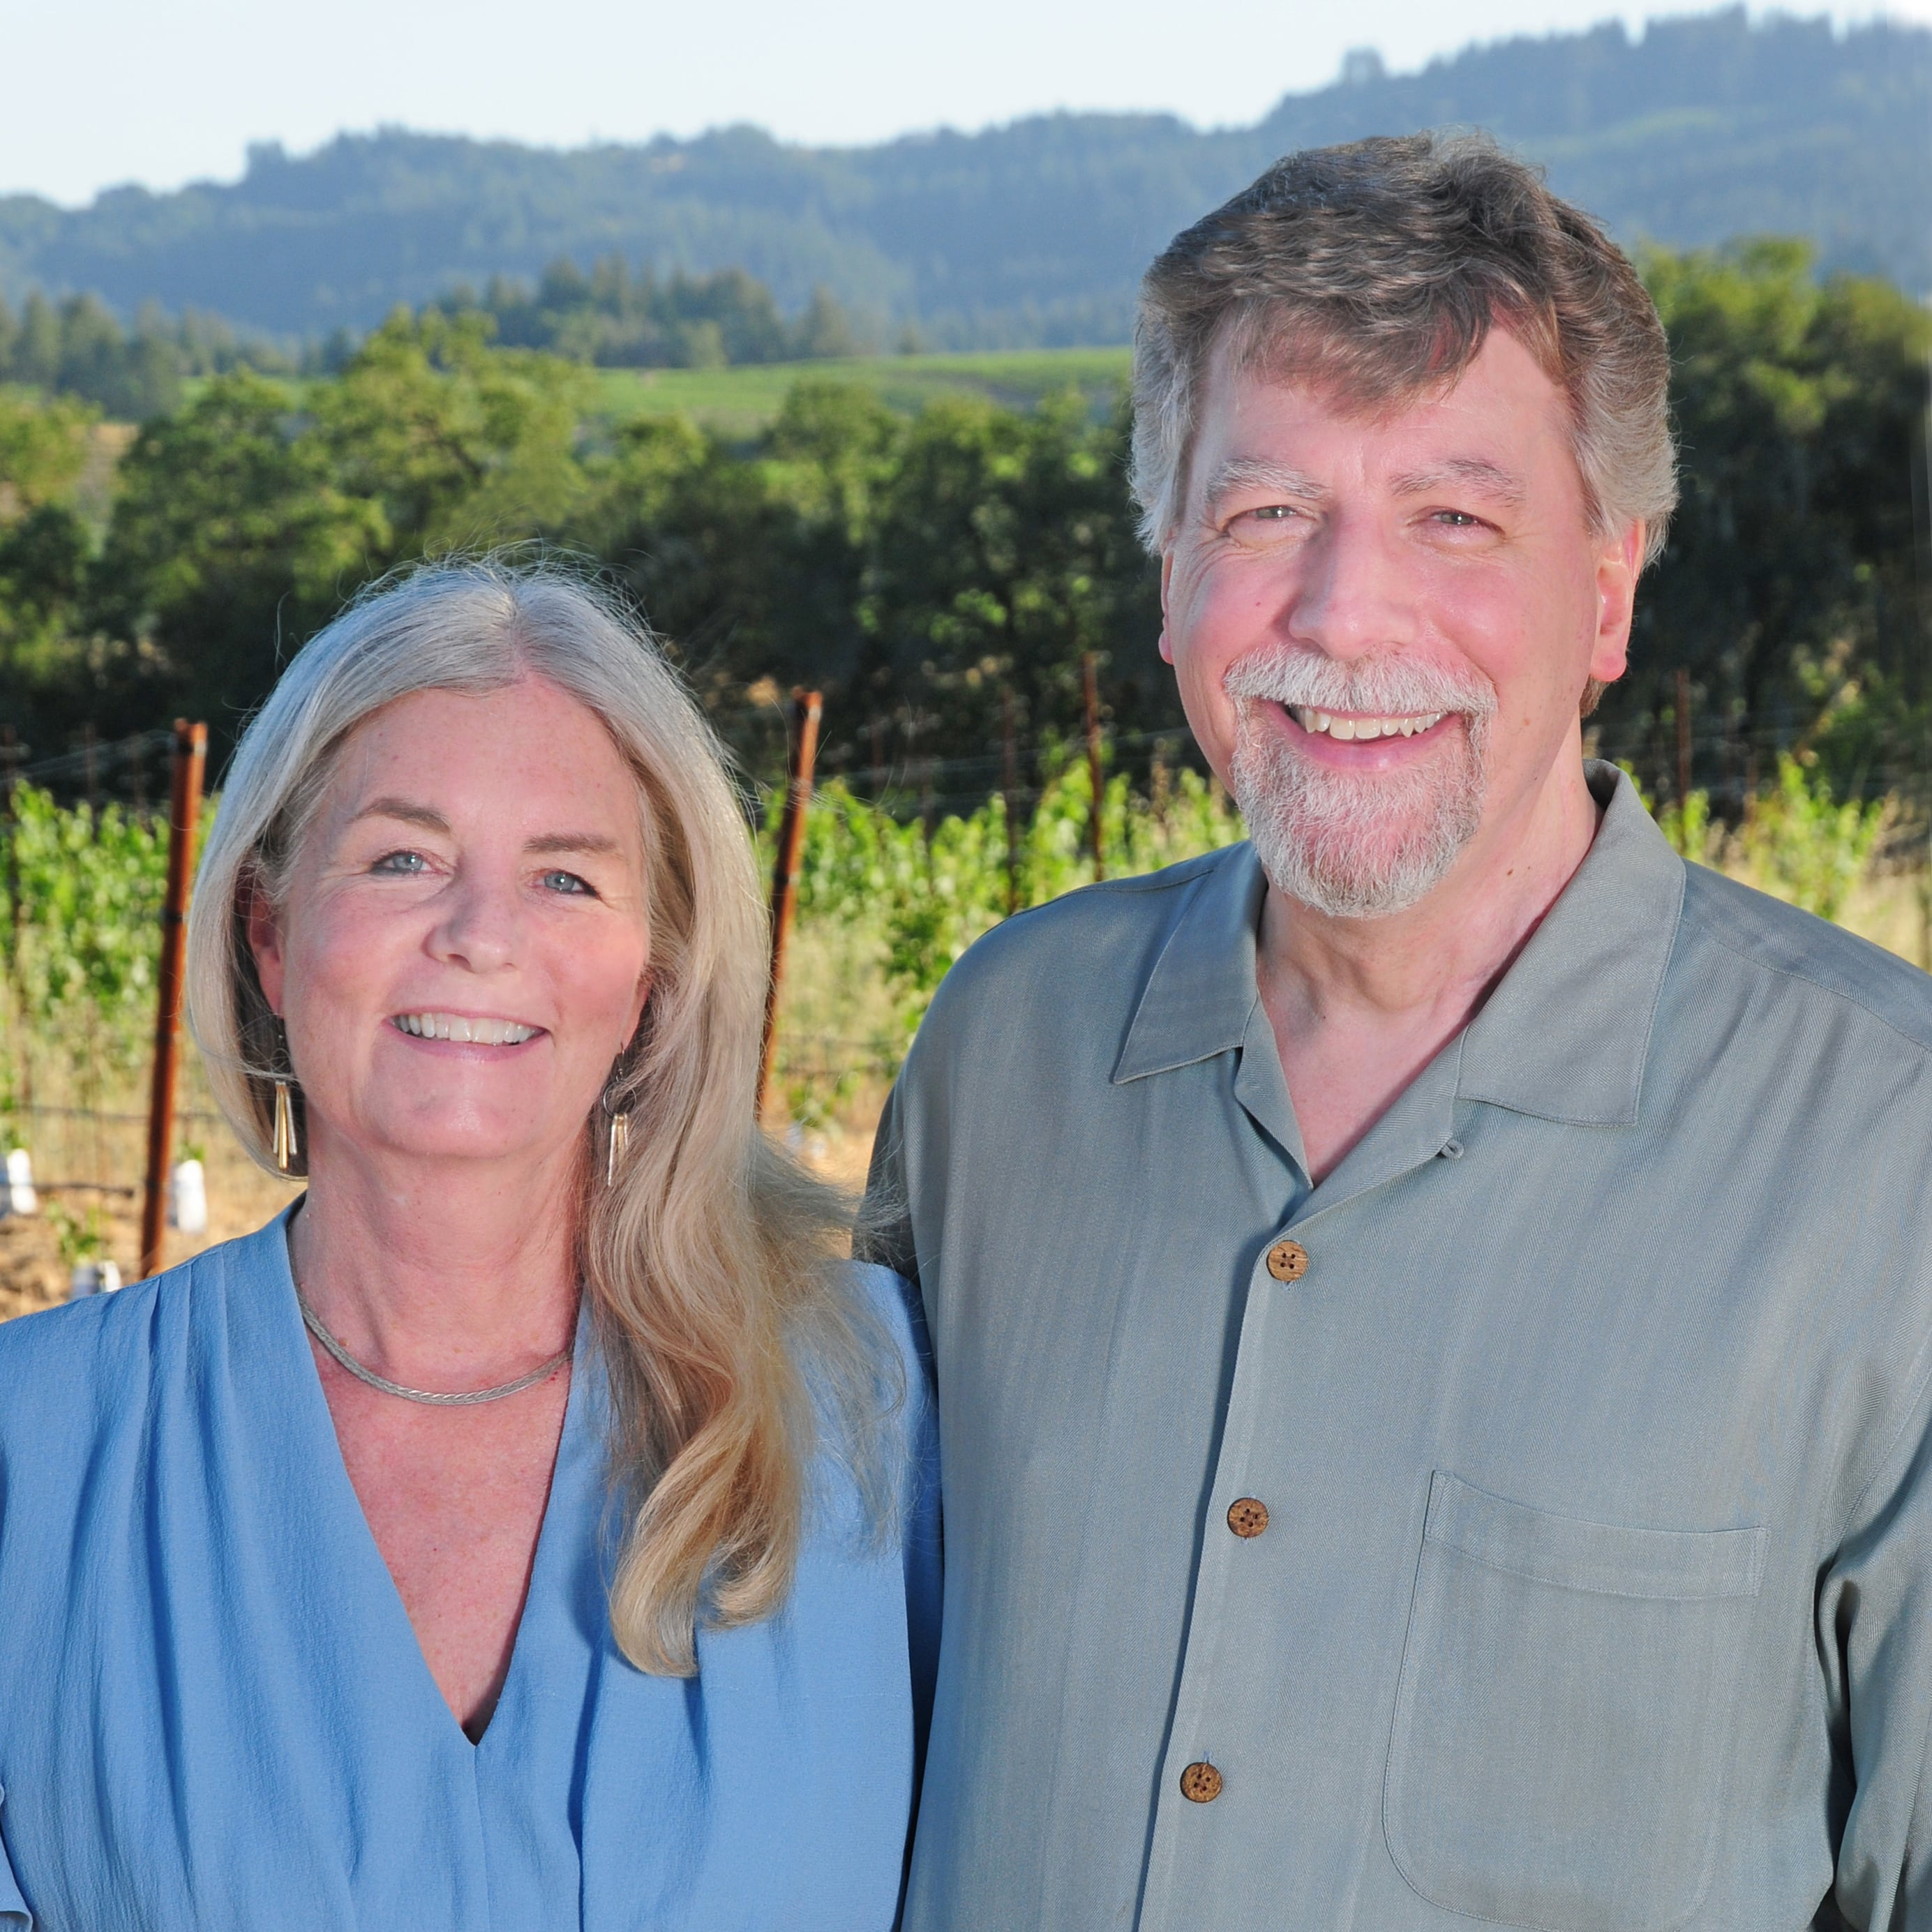 Paul & Jennifer Tincknell